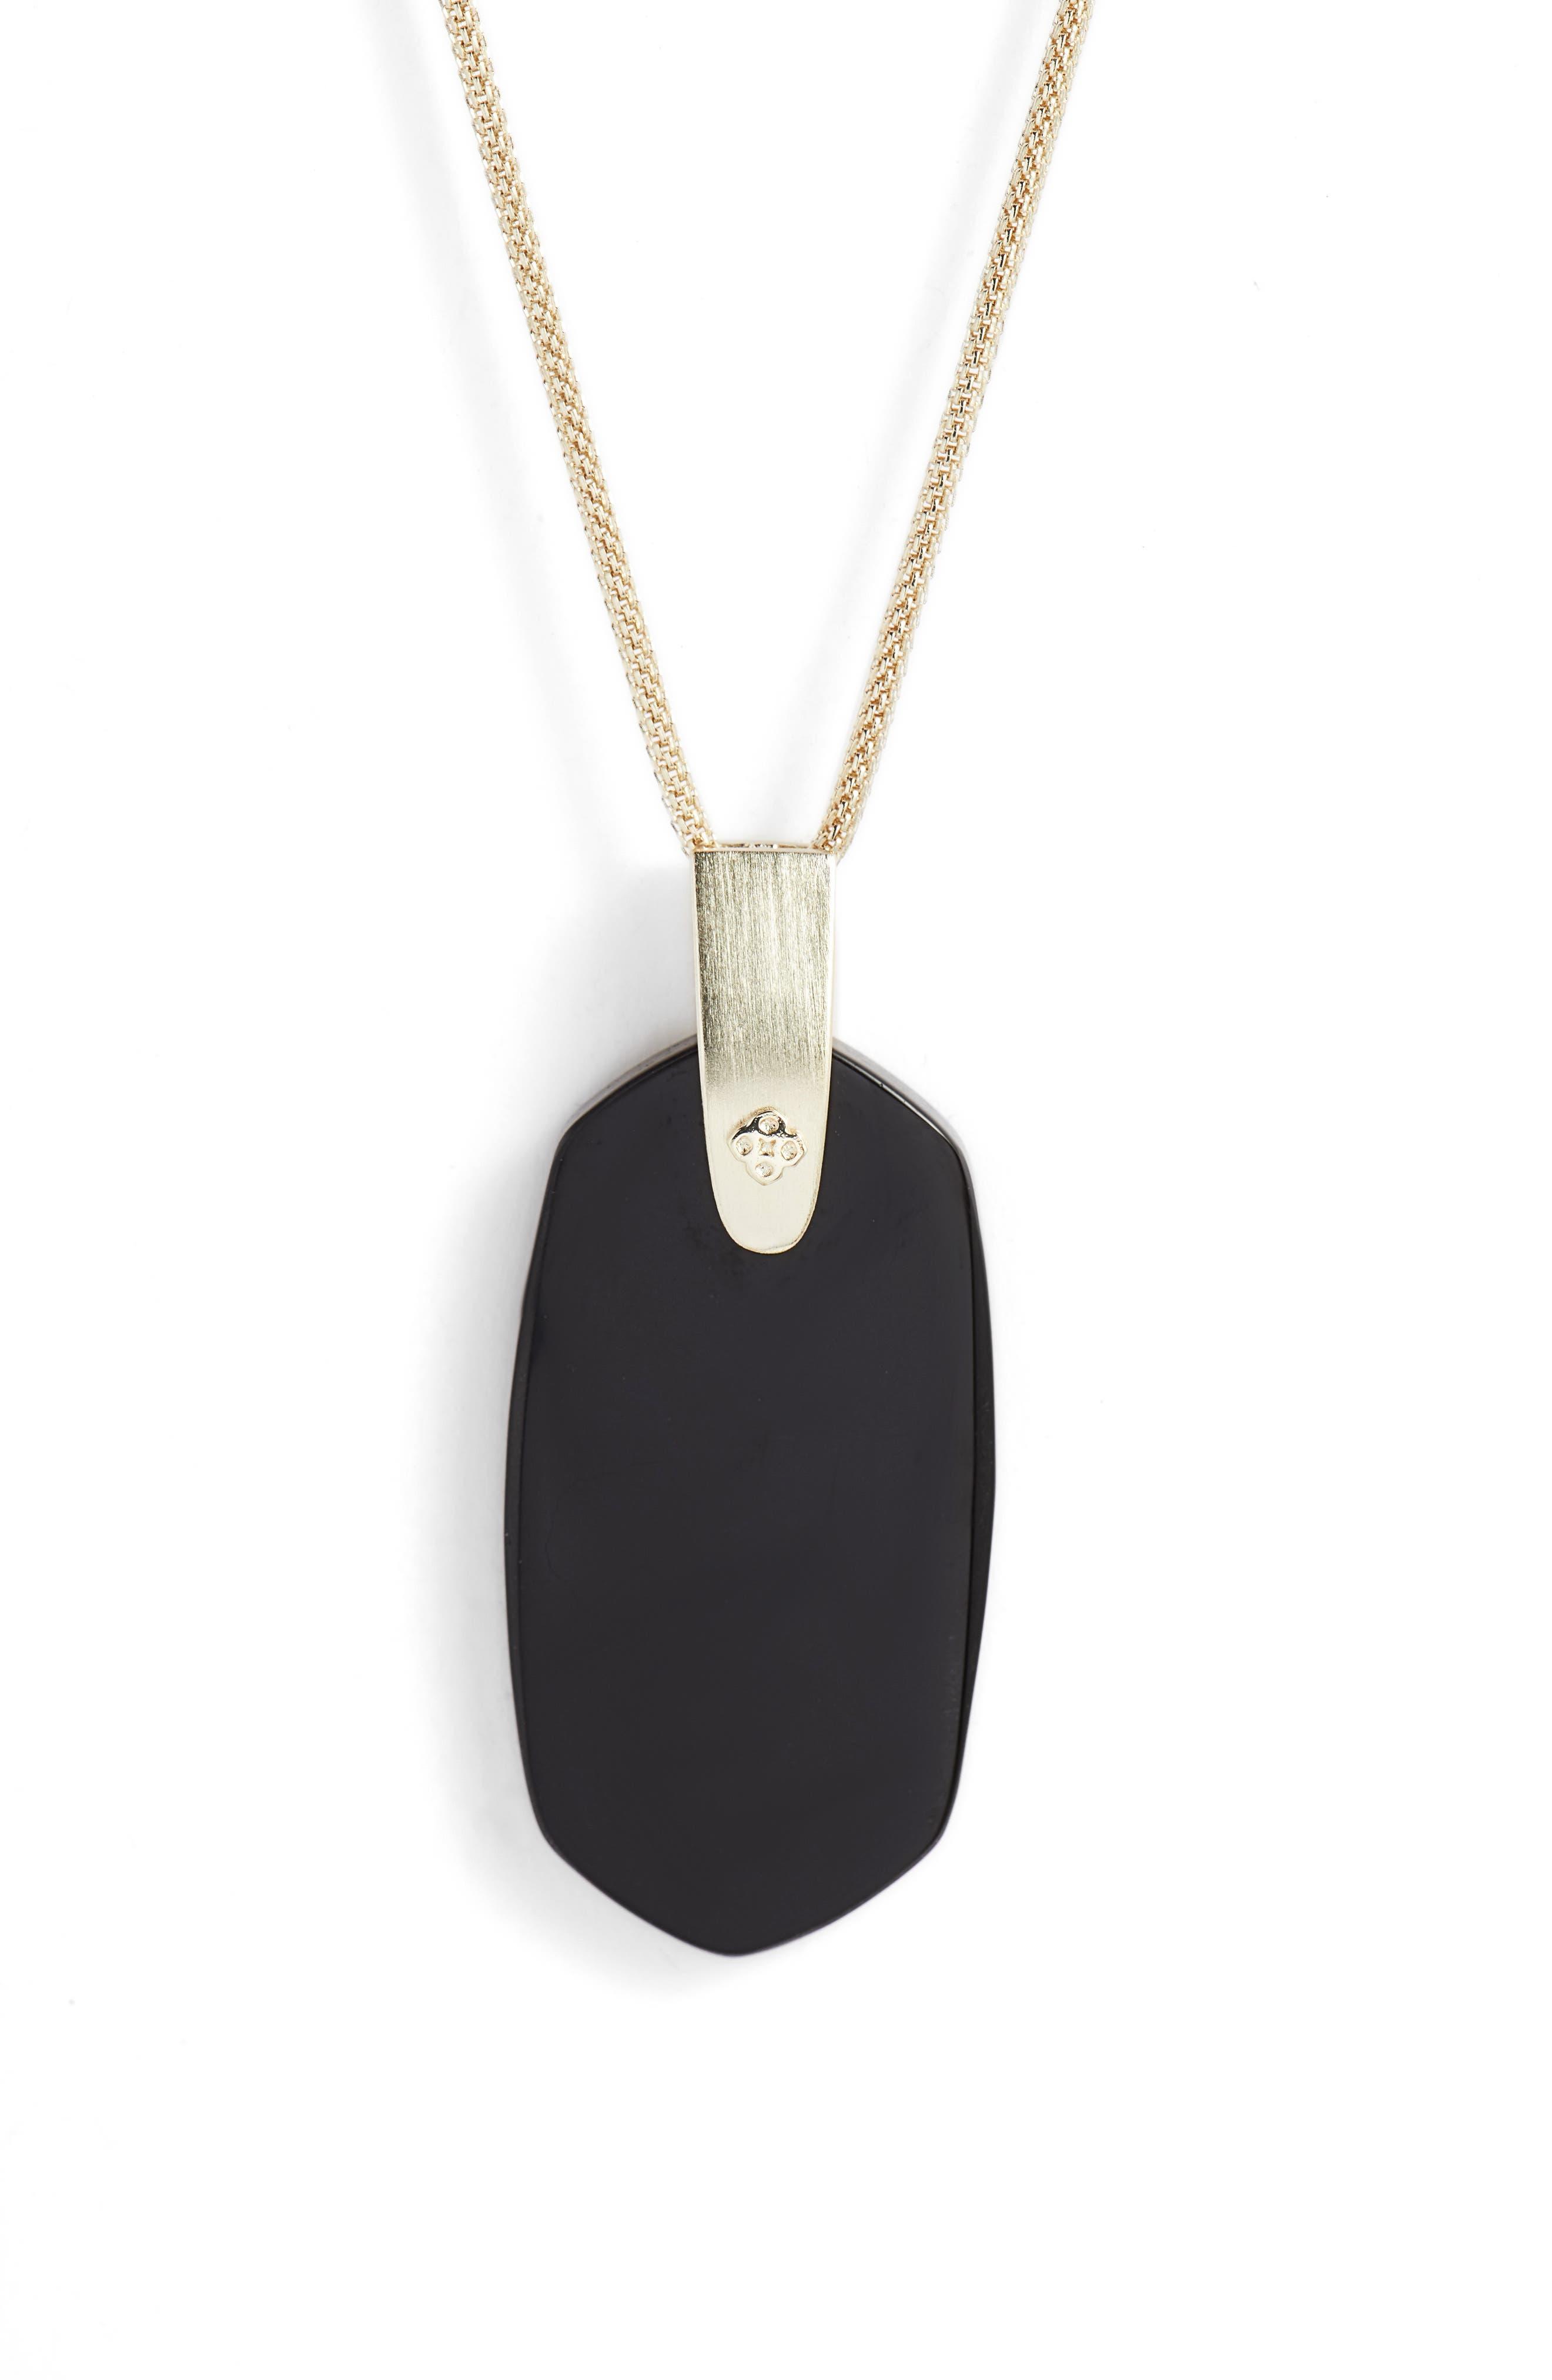 KENDRA SCOTT, Inez Pendant Necklace, Alternate thumbnail 3, color, BLACK/ GOLD